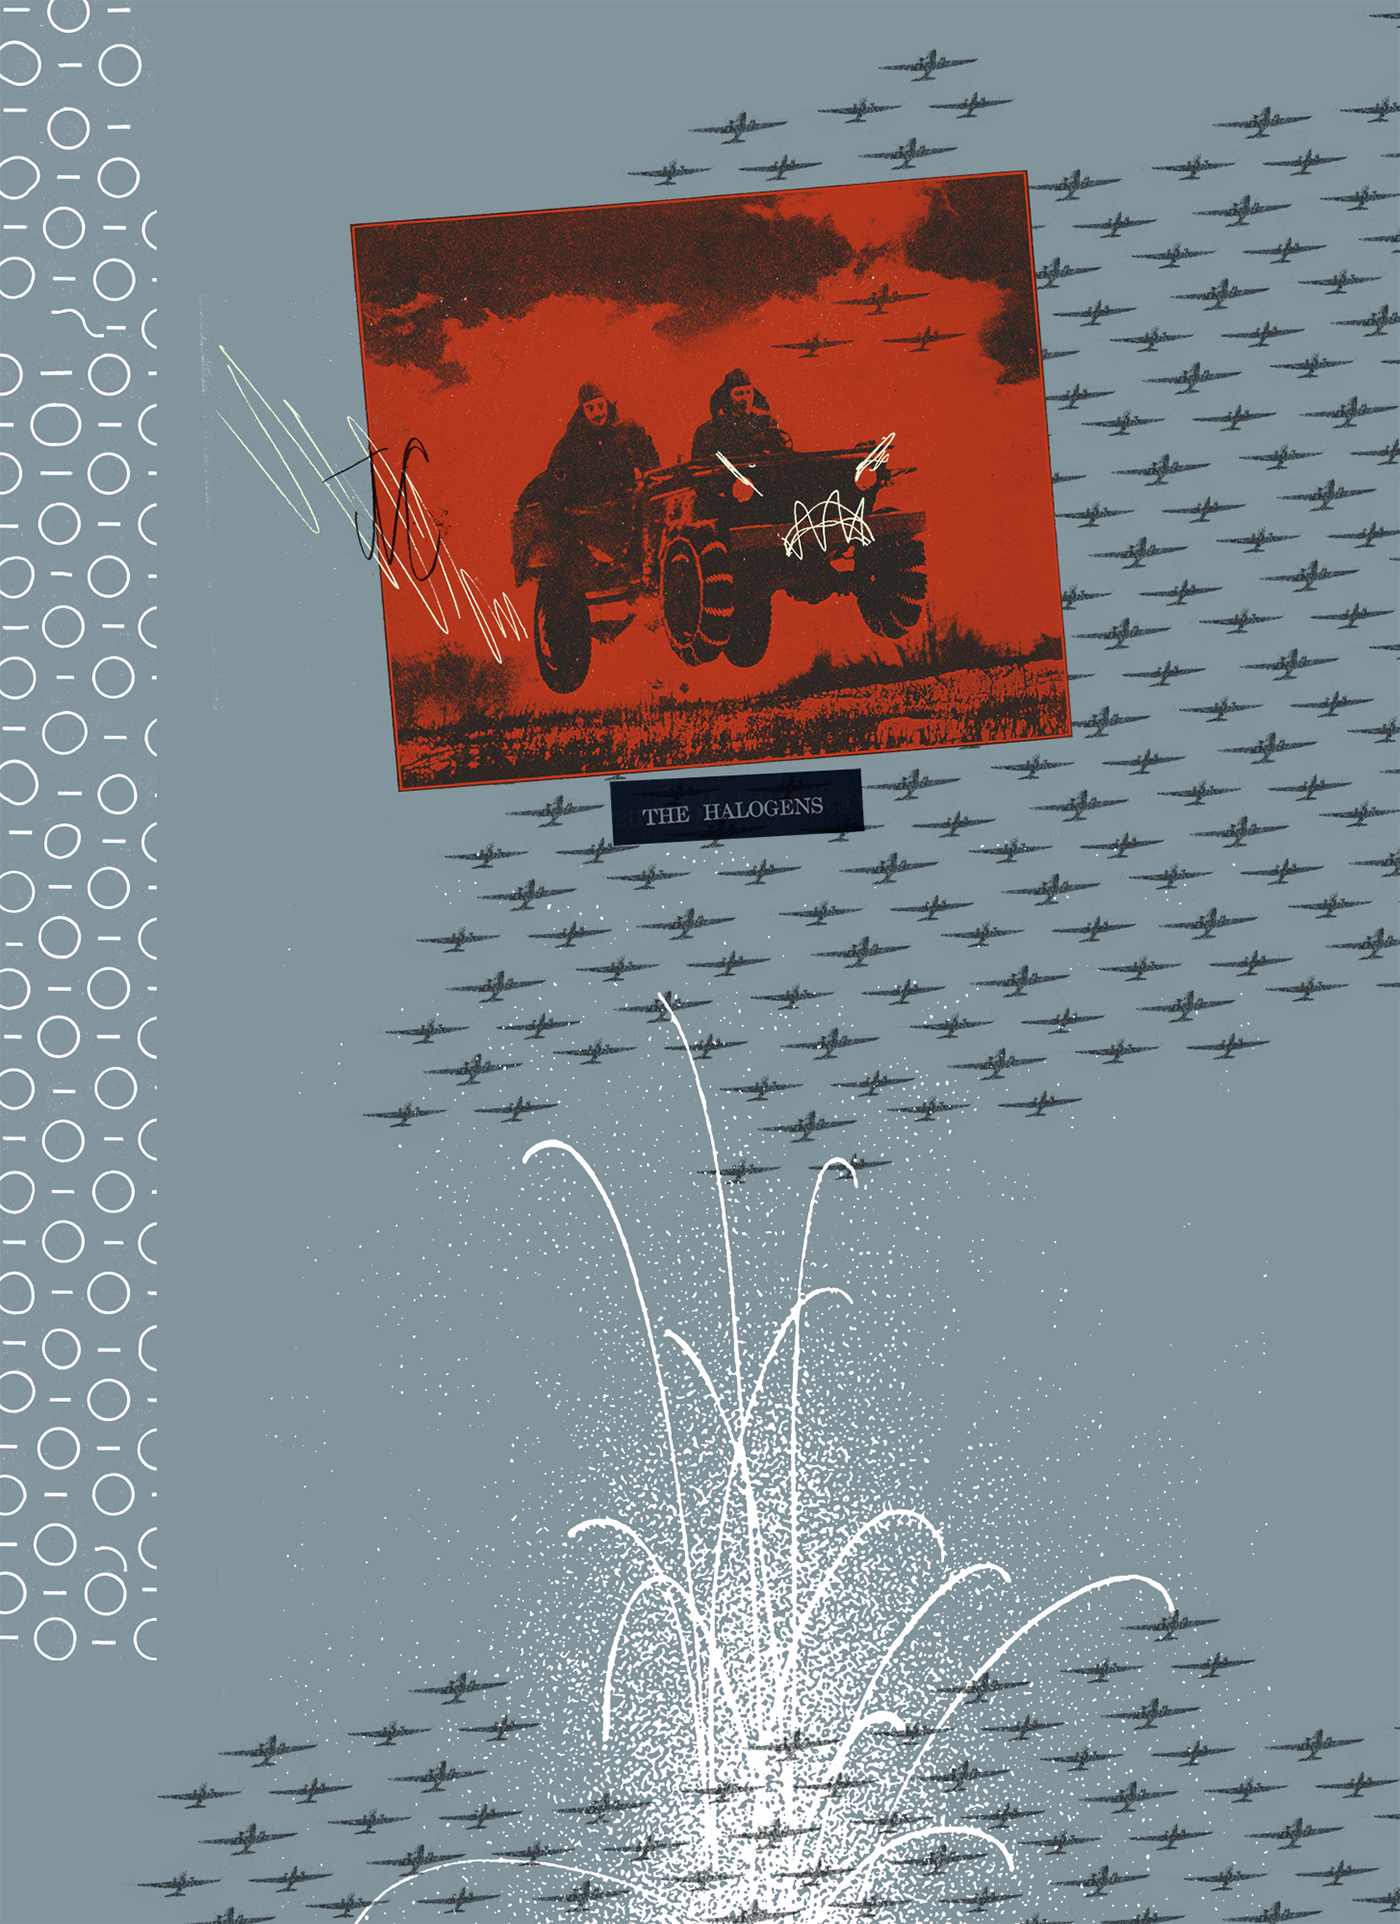 collage army Military chemistry chemist diamonds jewels bunson burner textbook element